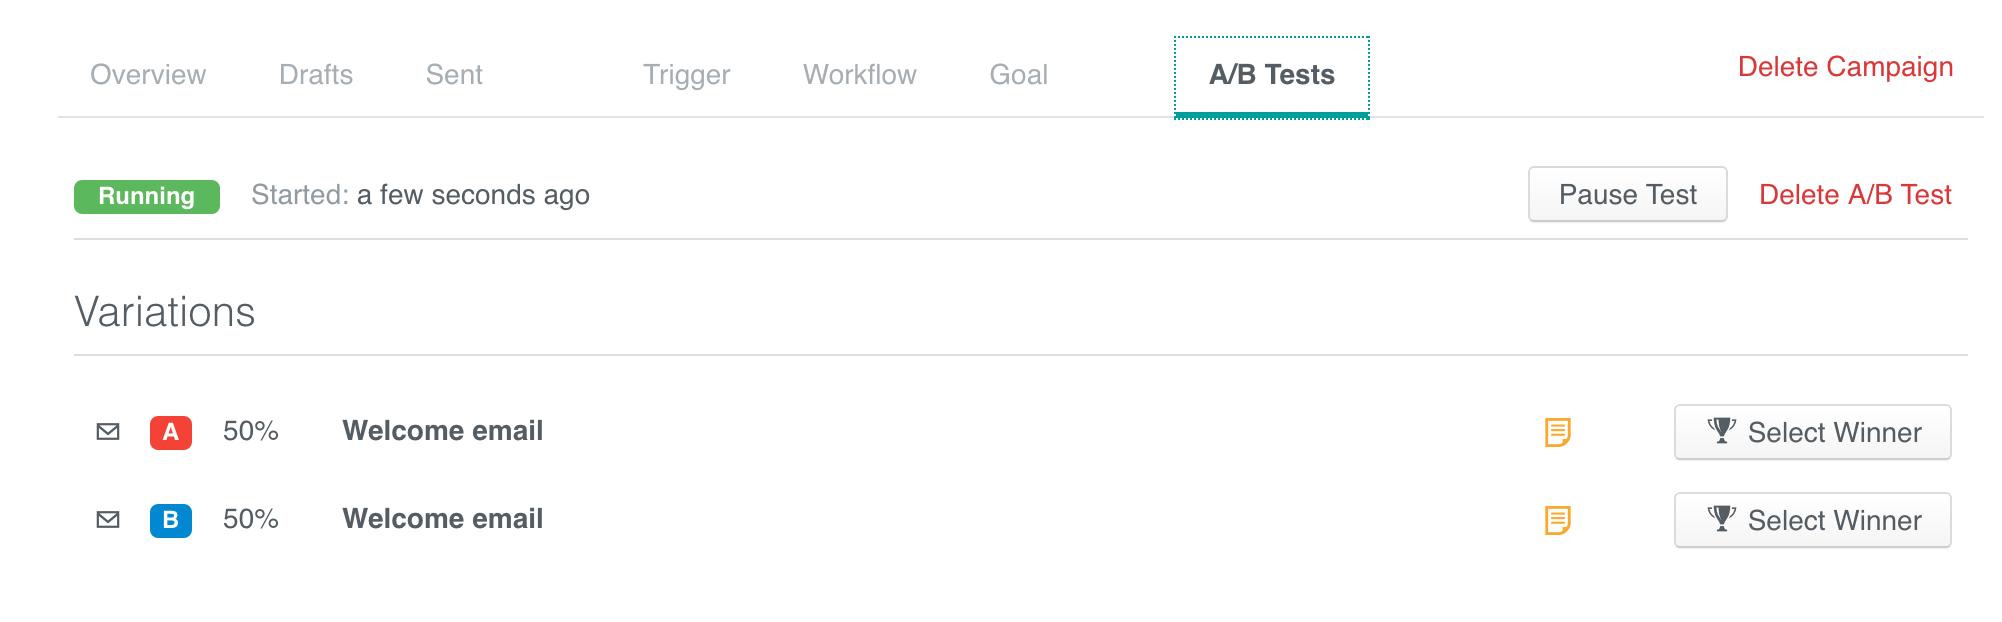 A/B Tests tab